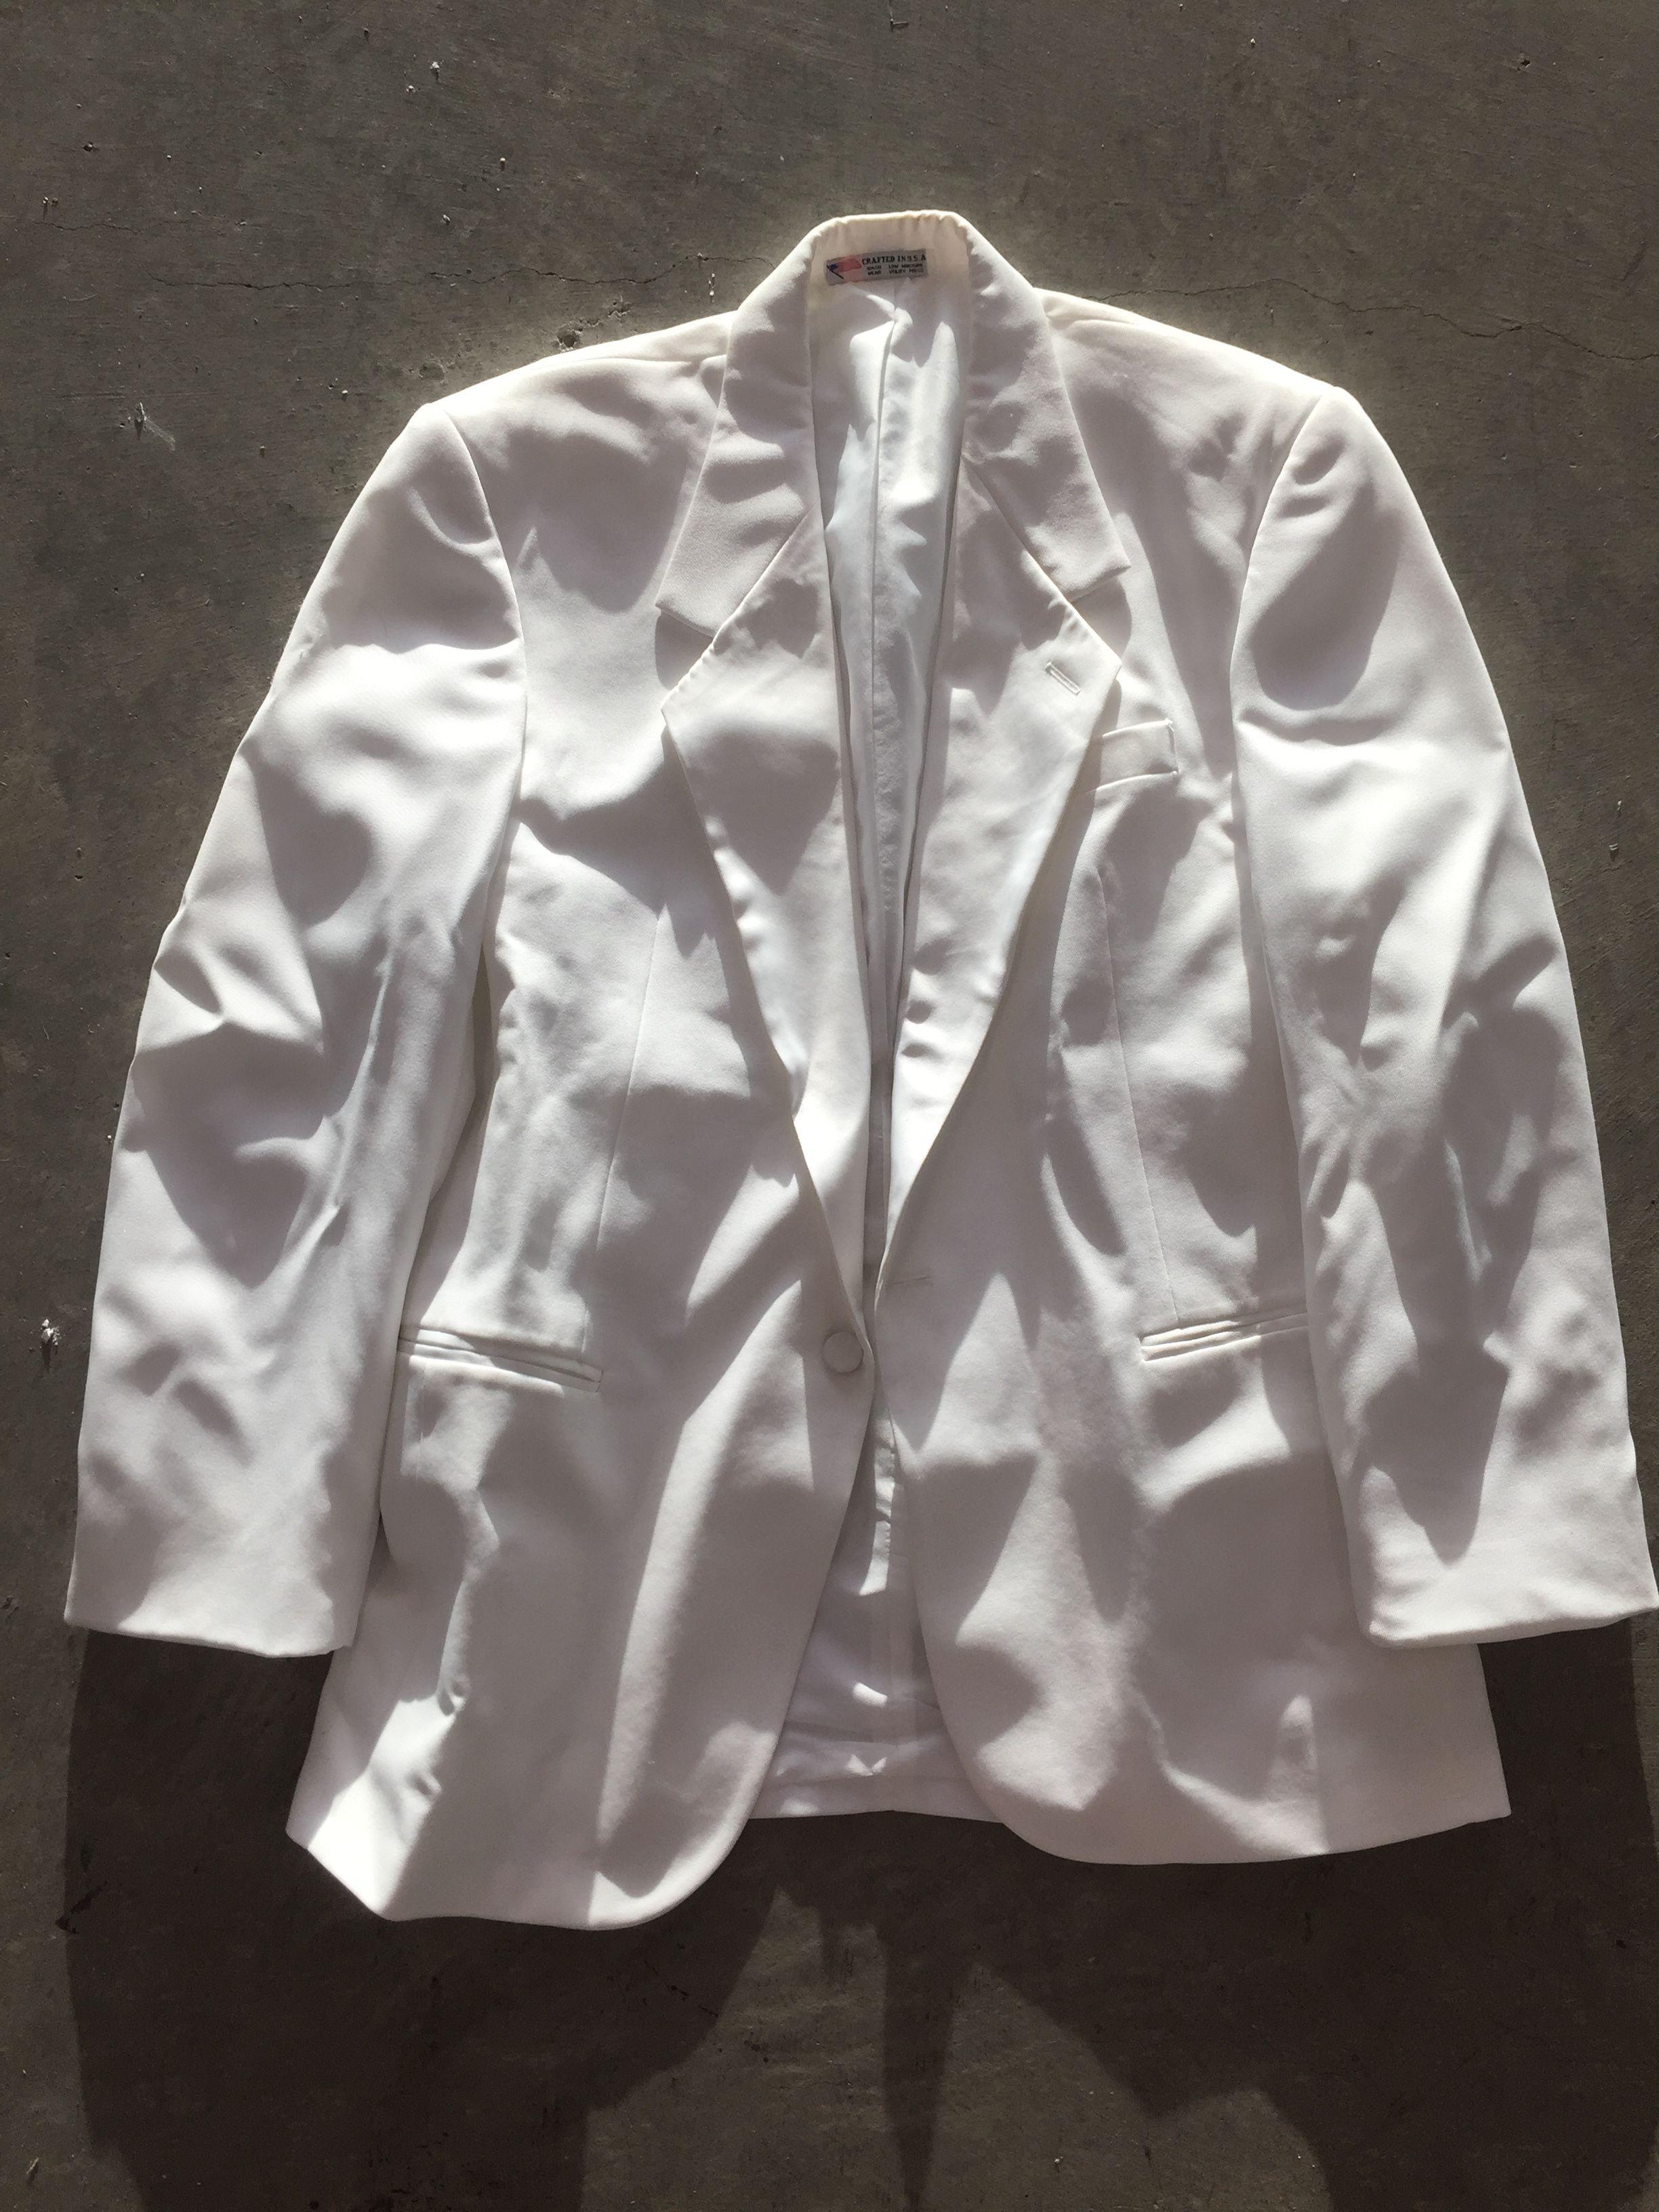 1 white suit jacket #LAUnboundWhite #LAUnboundGuys